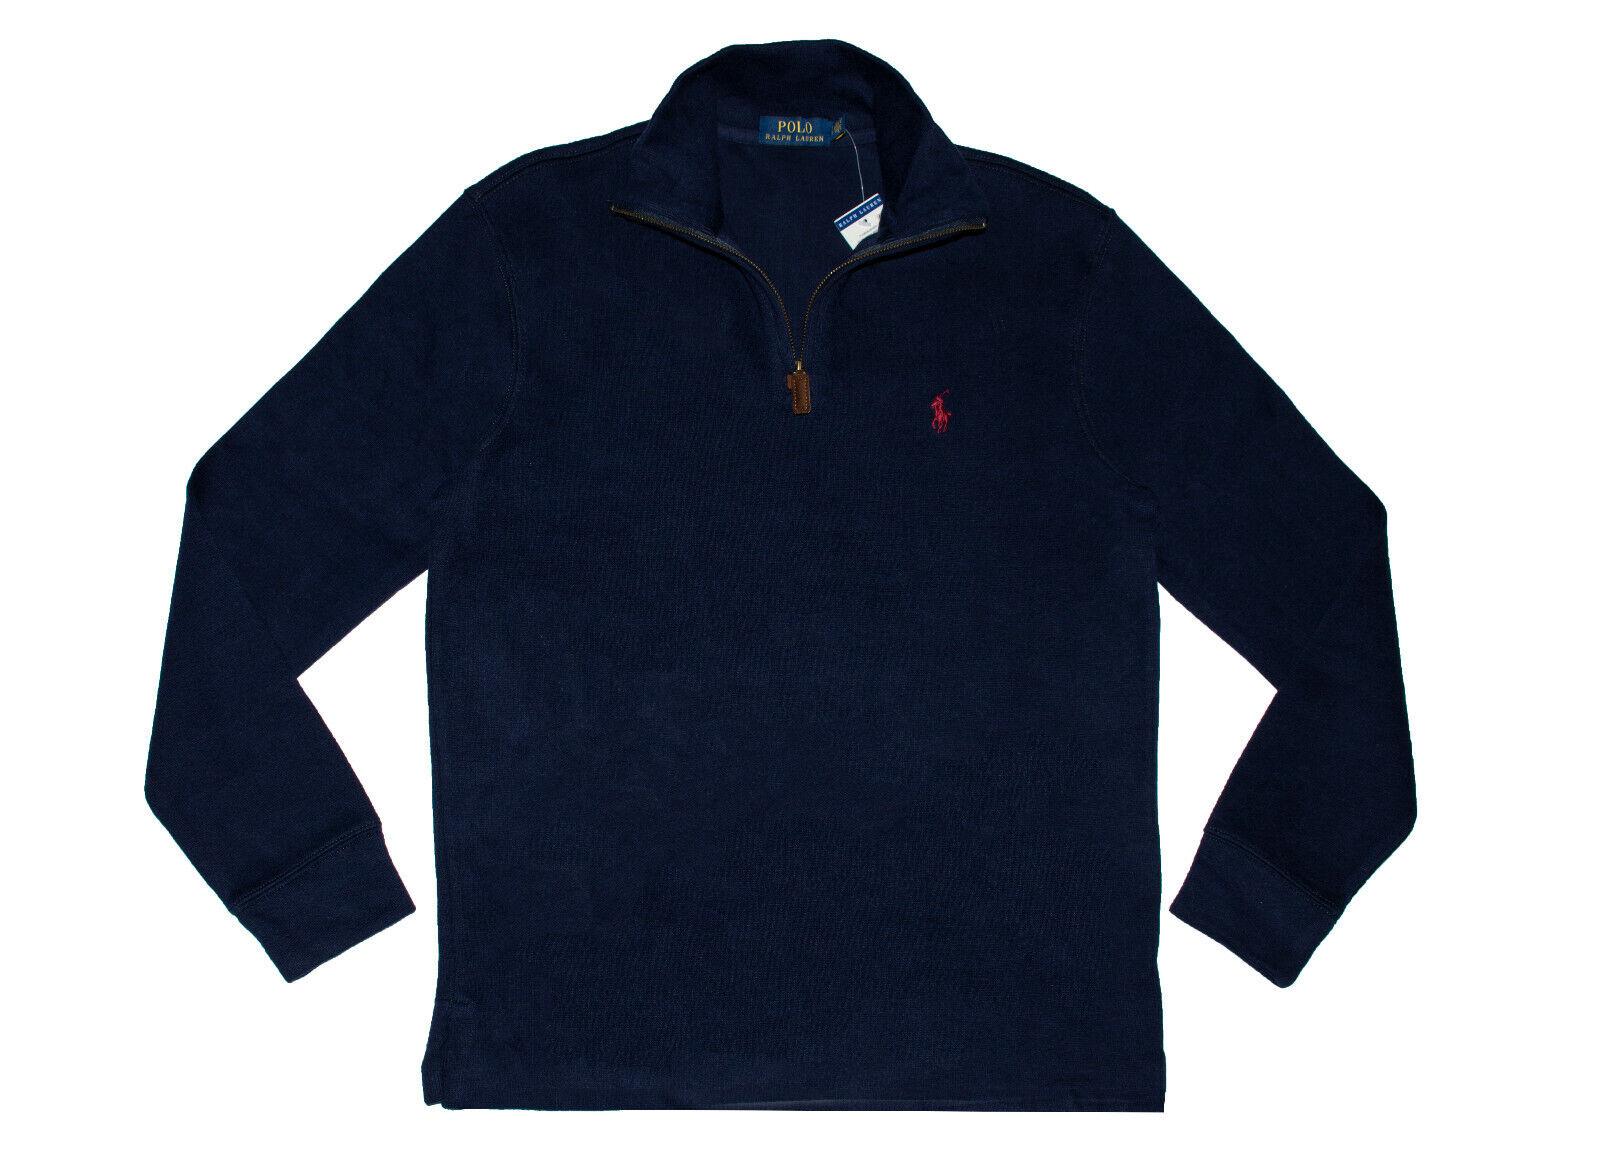 acfb6d003ad Polo Ralph Lauren Men s Half Zip French Rib Cotton Sweater Navy ...